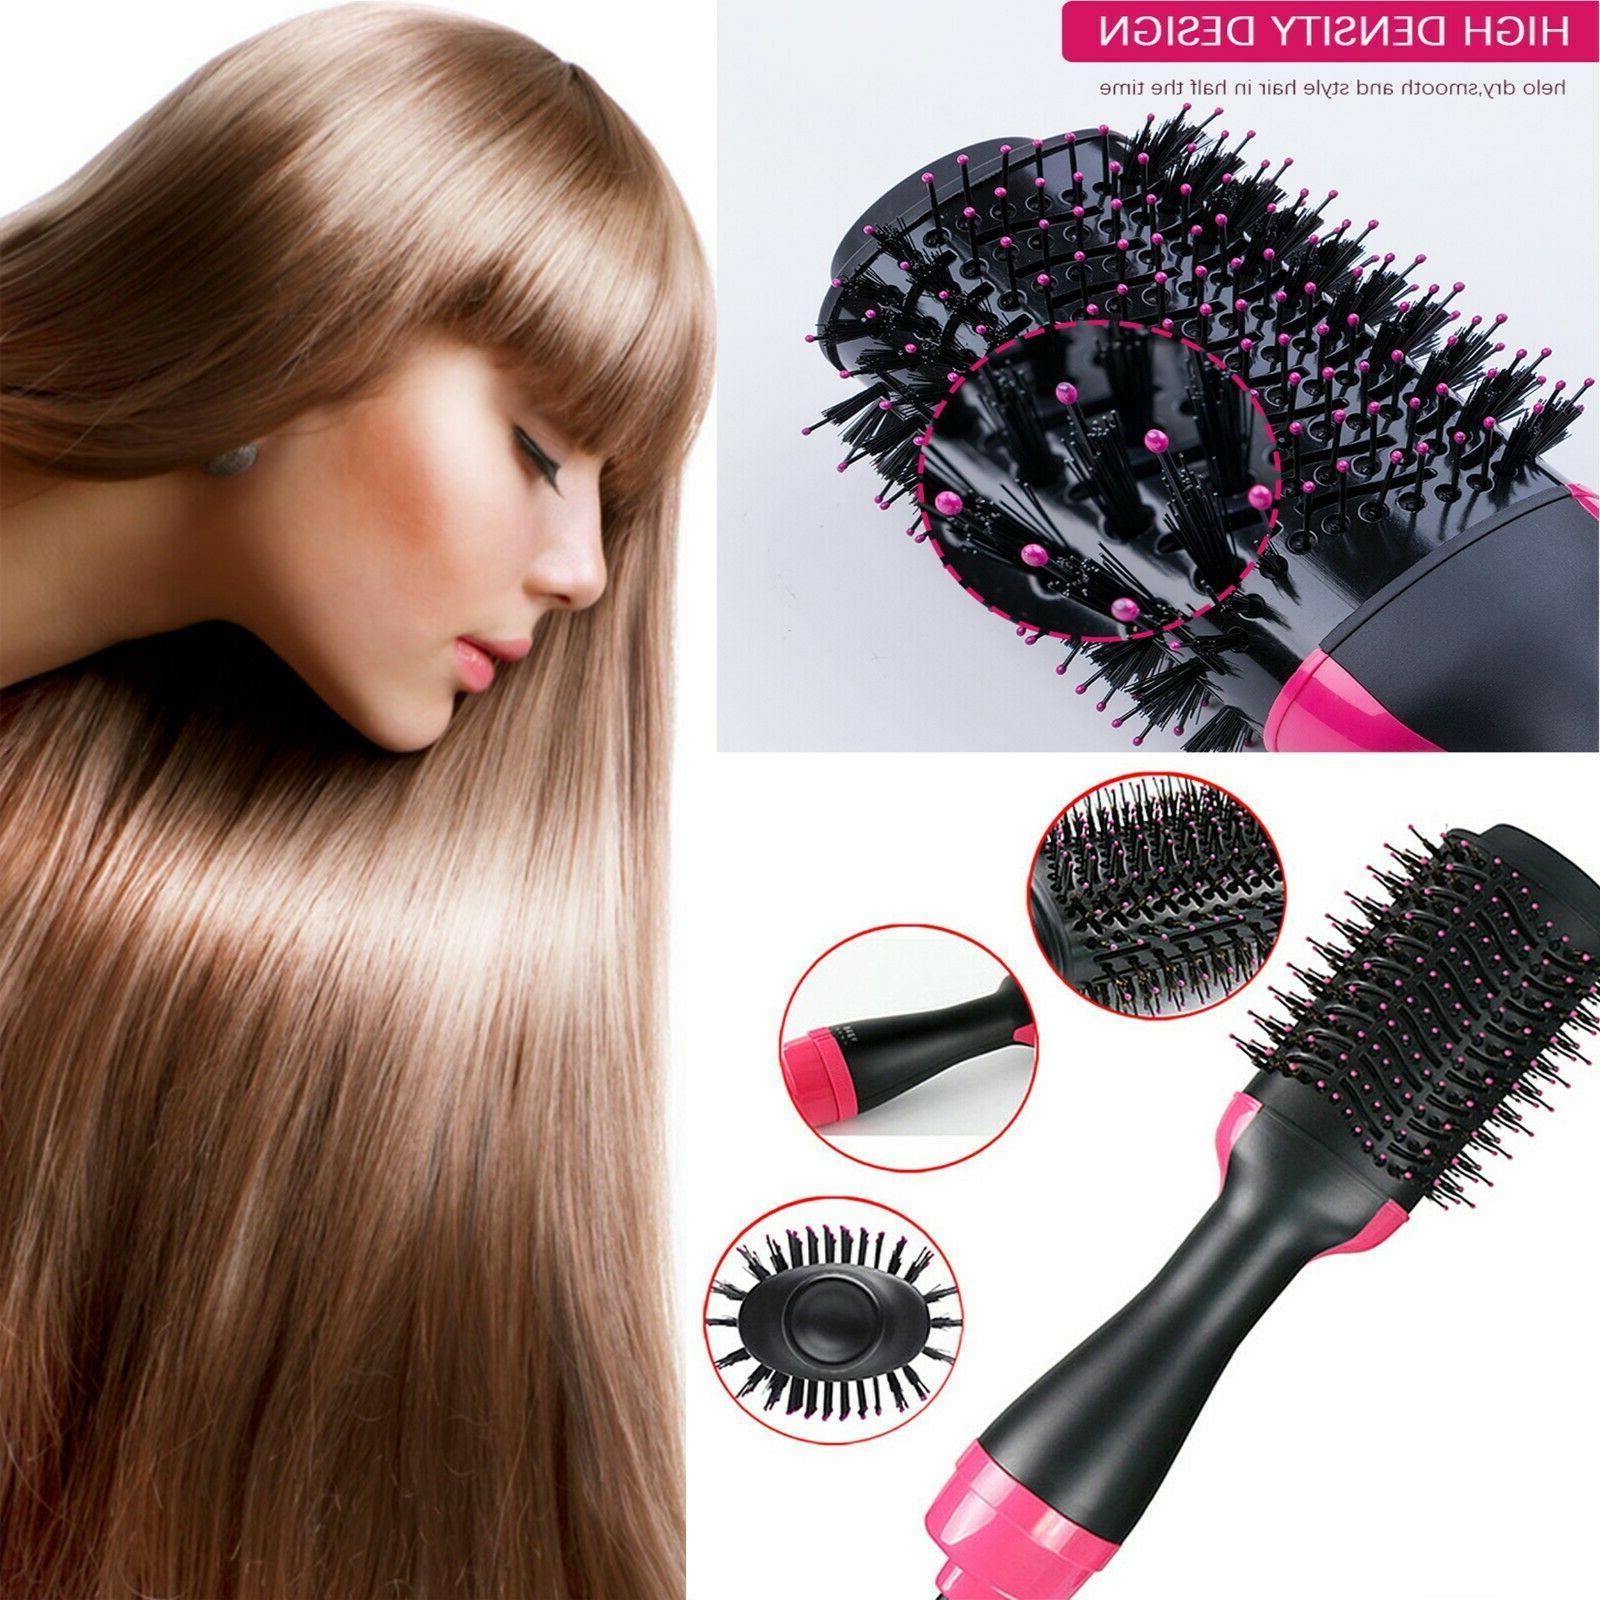 Hair Dryer Brush,Hot Volumizer, Styler Straightening